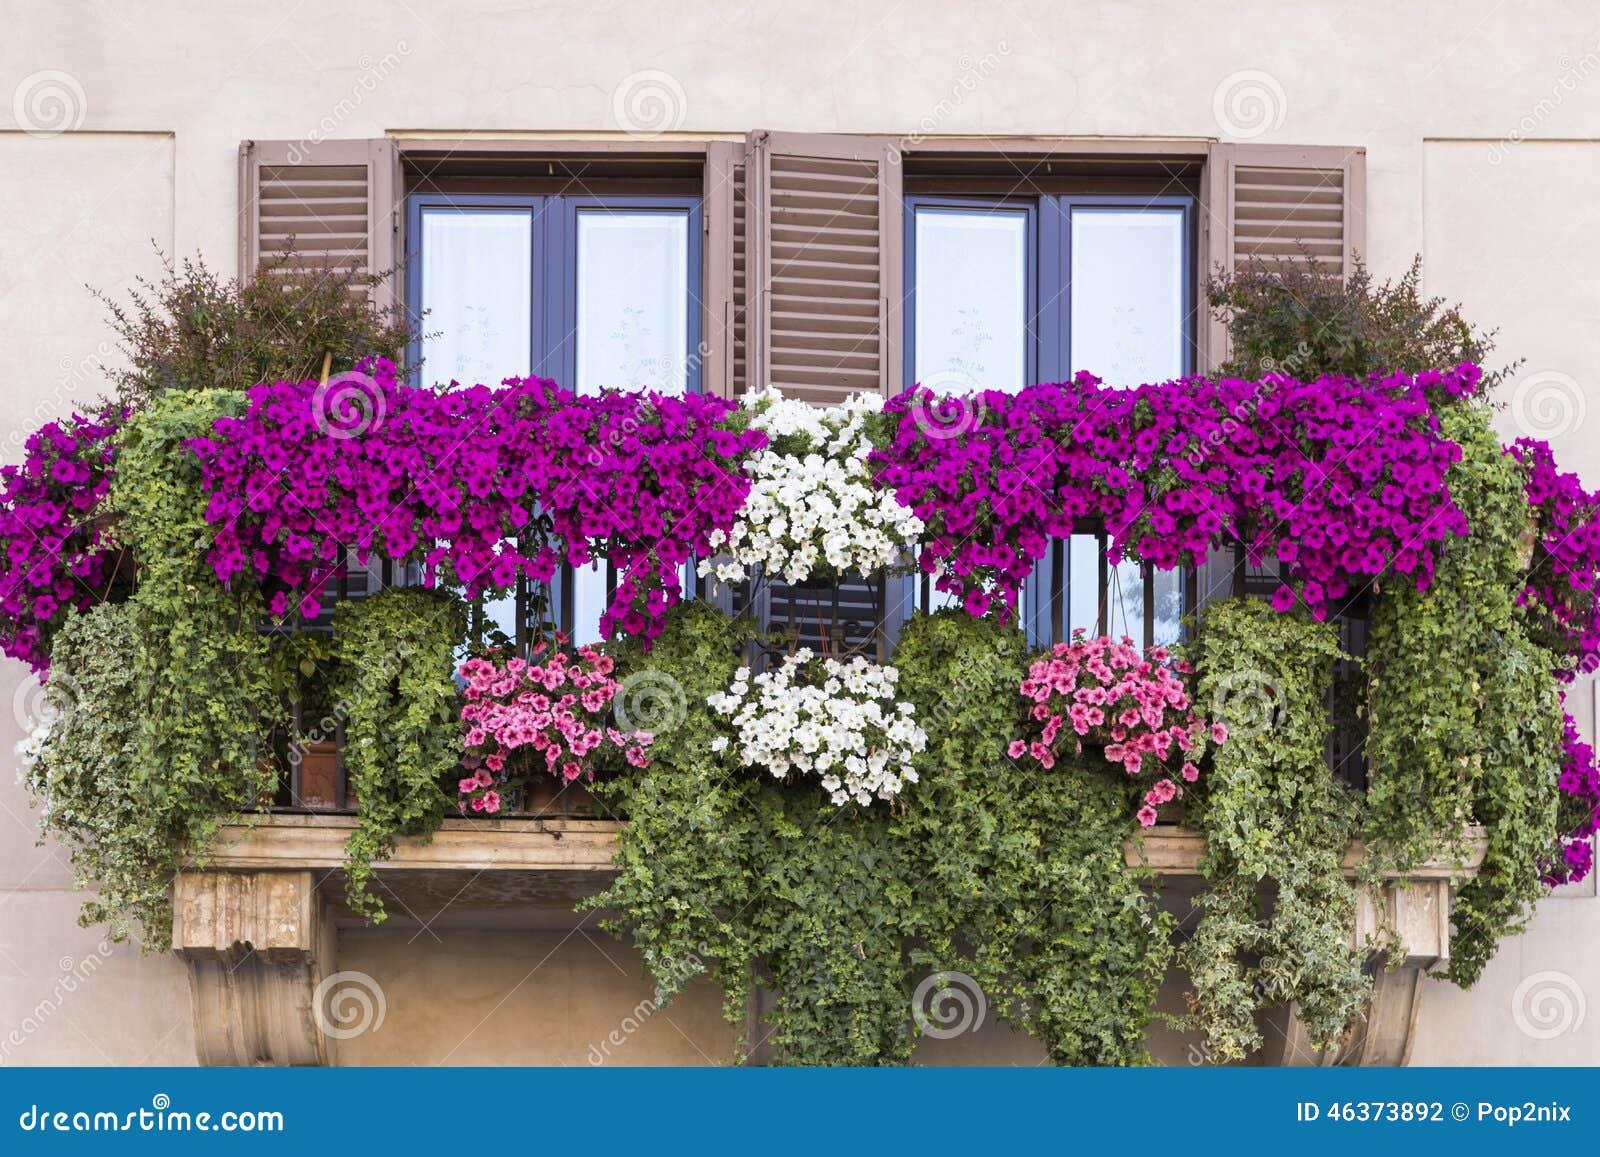 Violetter blumentopf auf balkon rom stockfoto bild von for Blumentopfe balkon